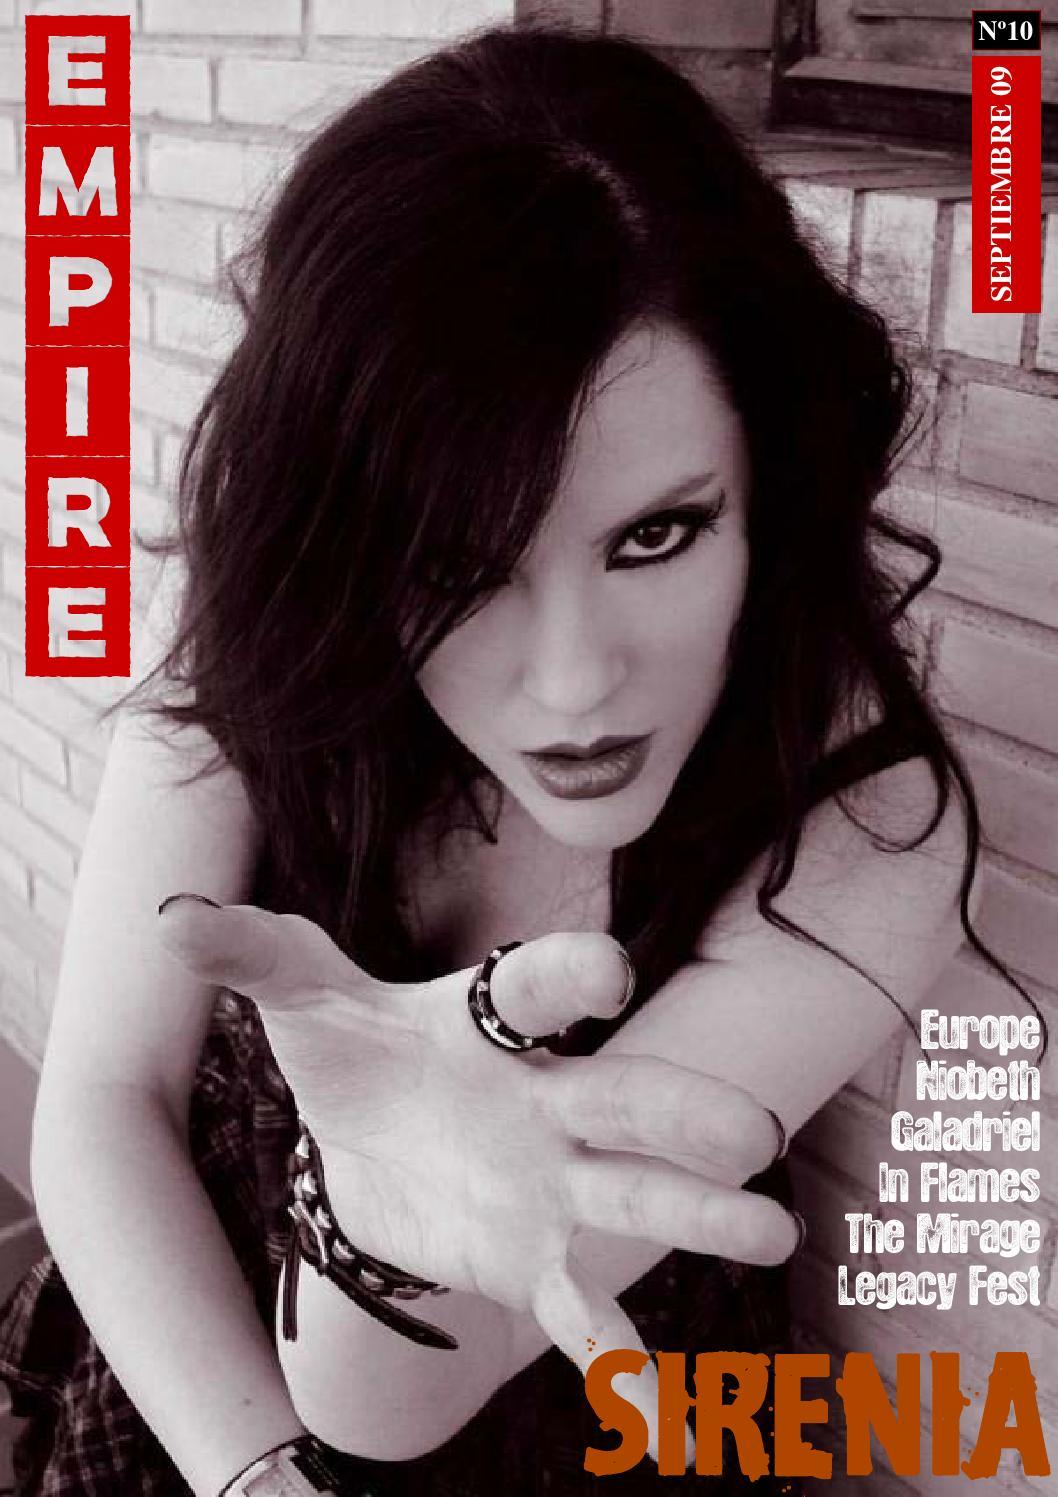 Actriz Porno Tatuada Y Rapada empire 10empire magazine - issuu